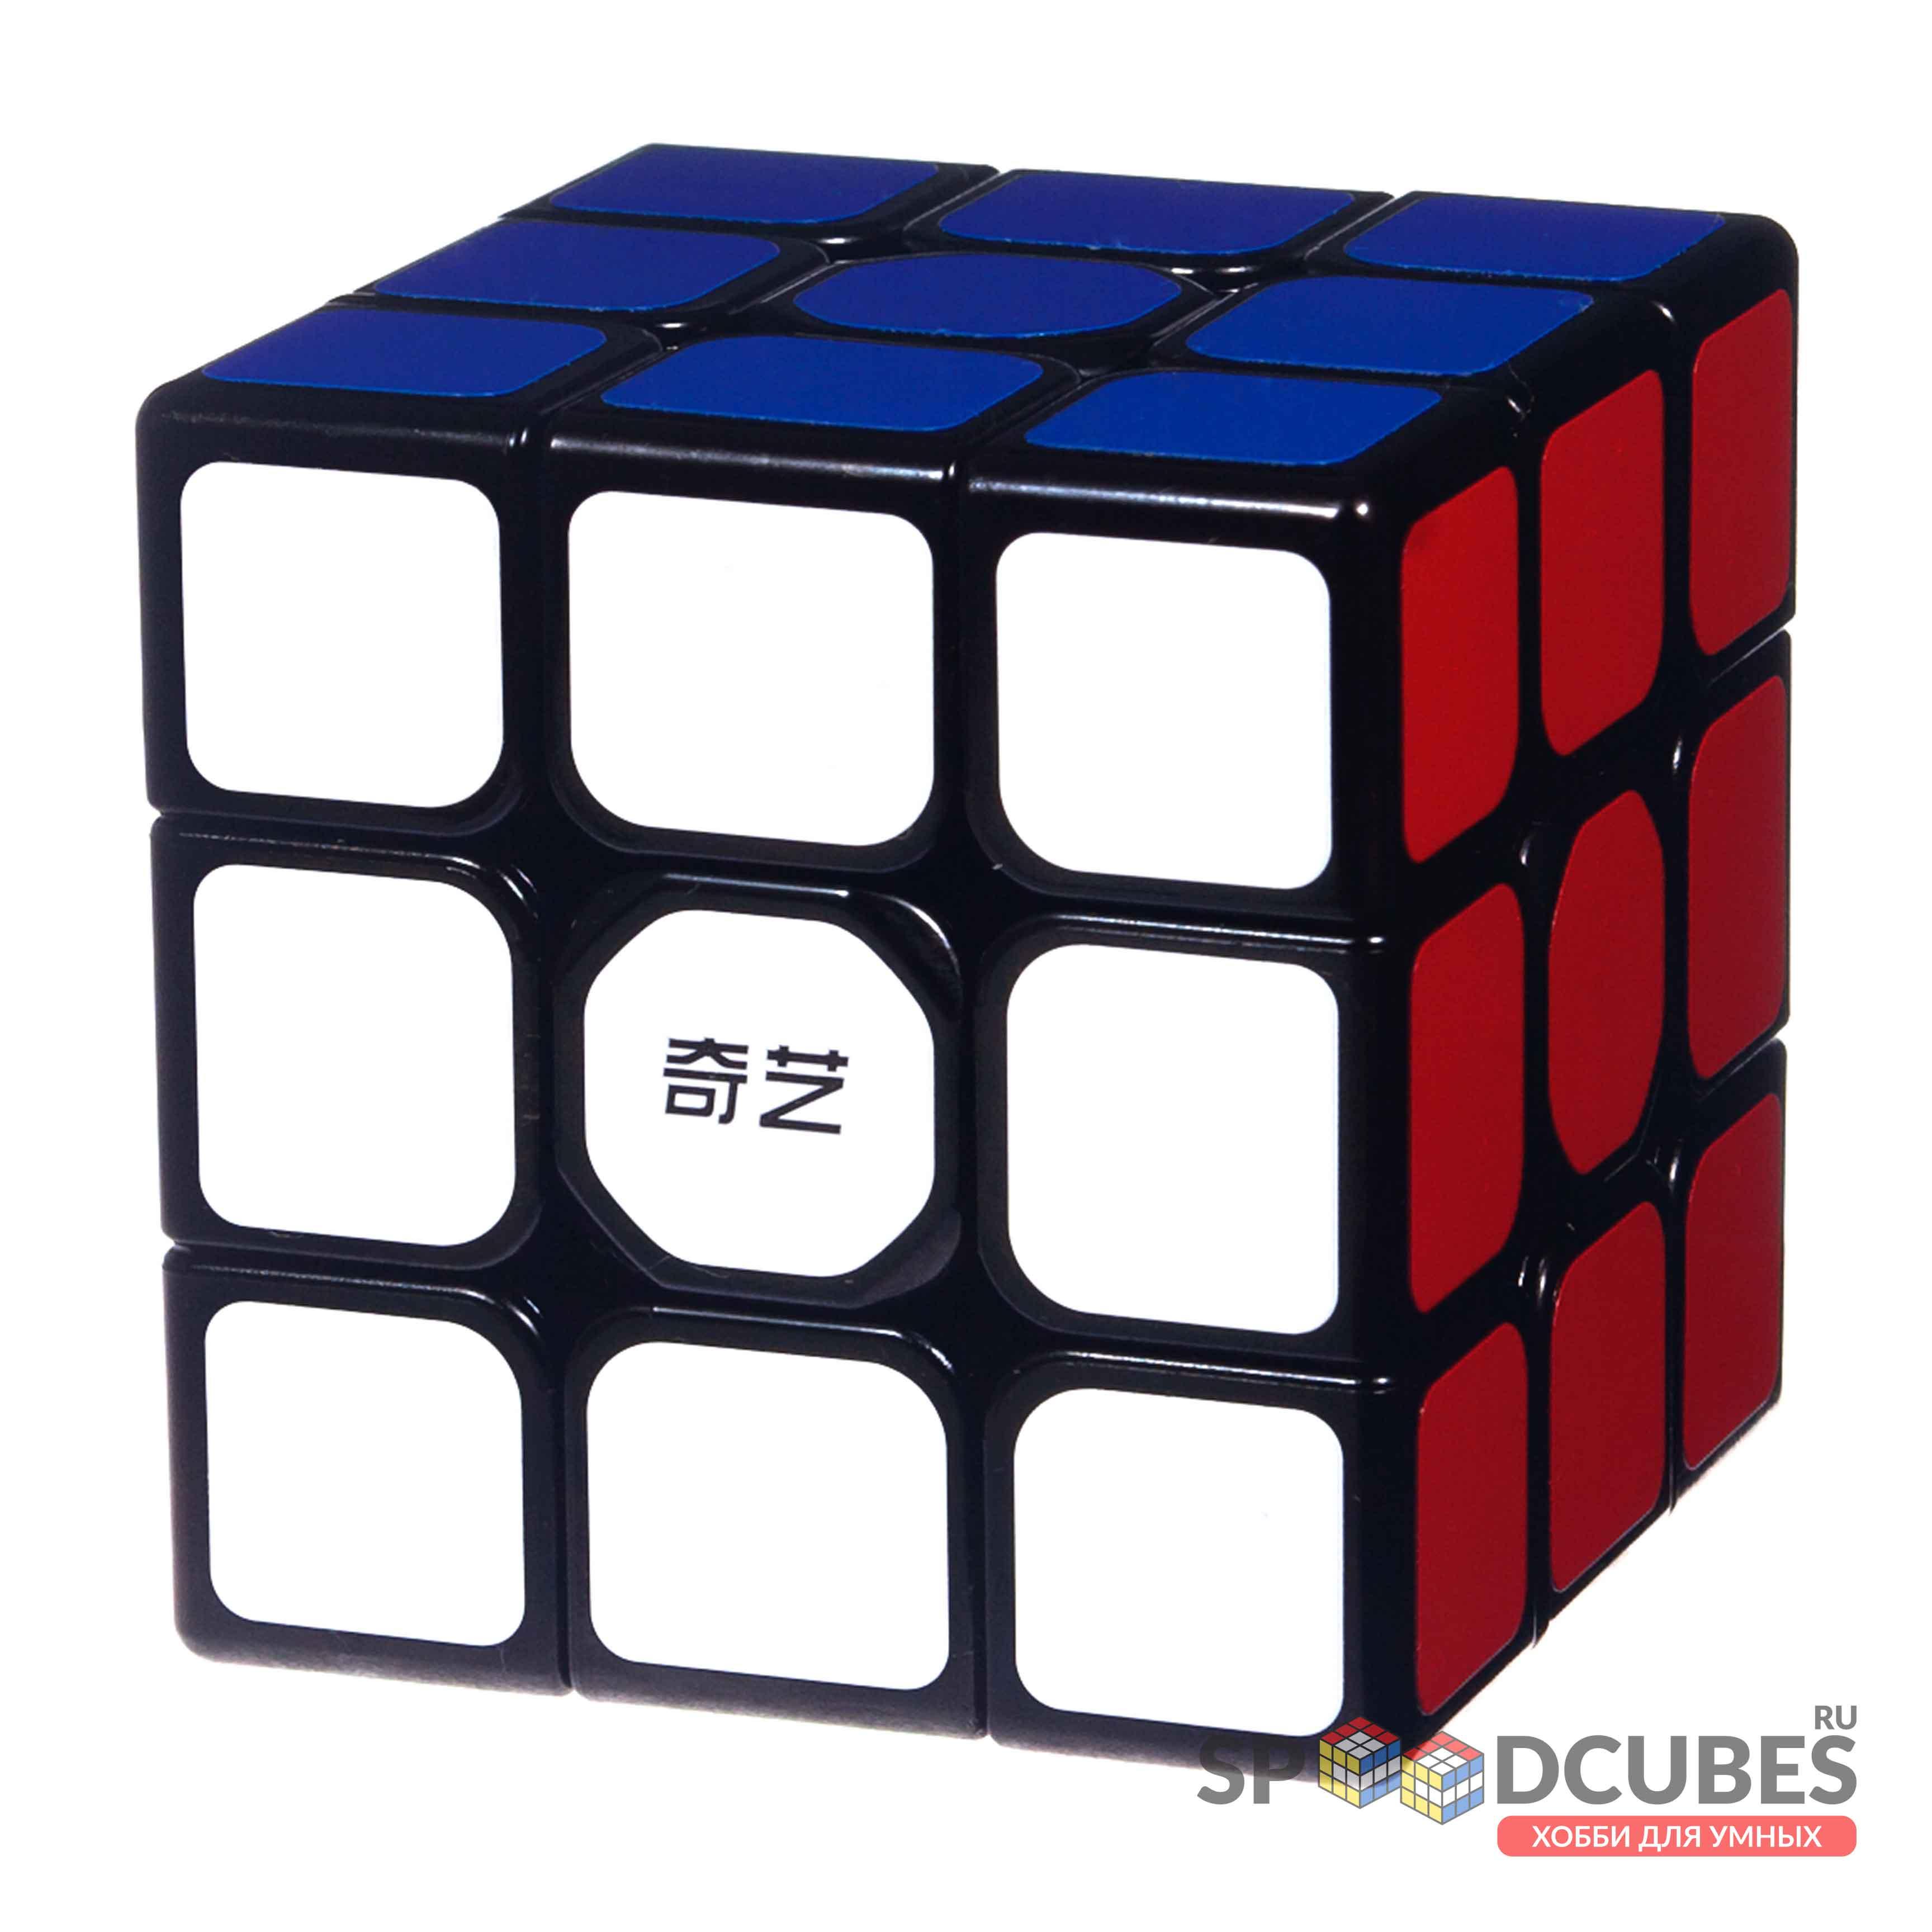 QiYi (MoFangGe) 3x3x3 Sail W